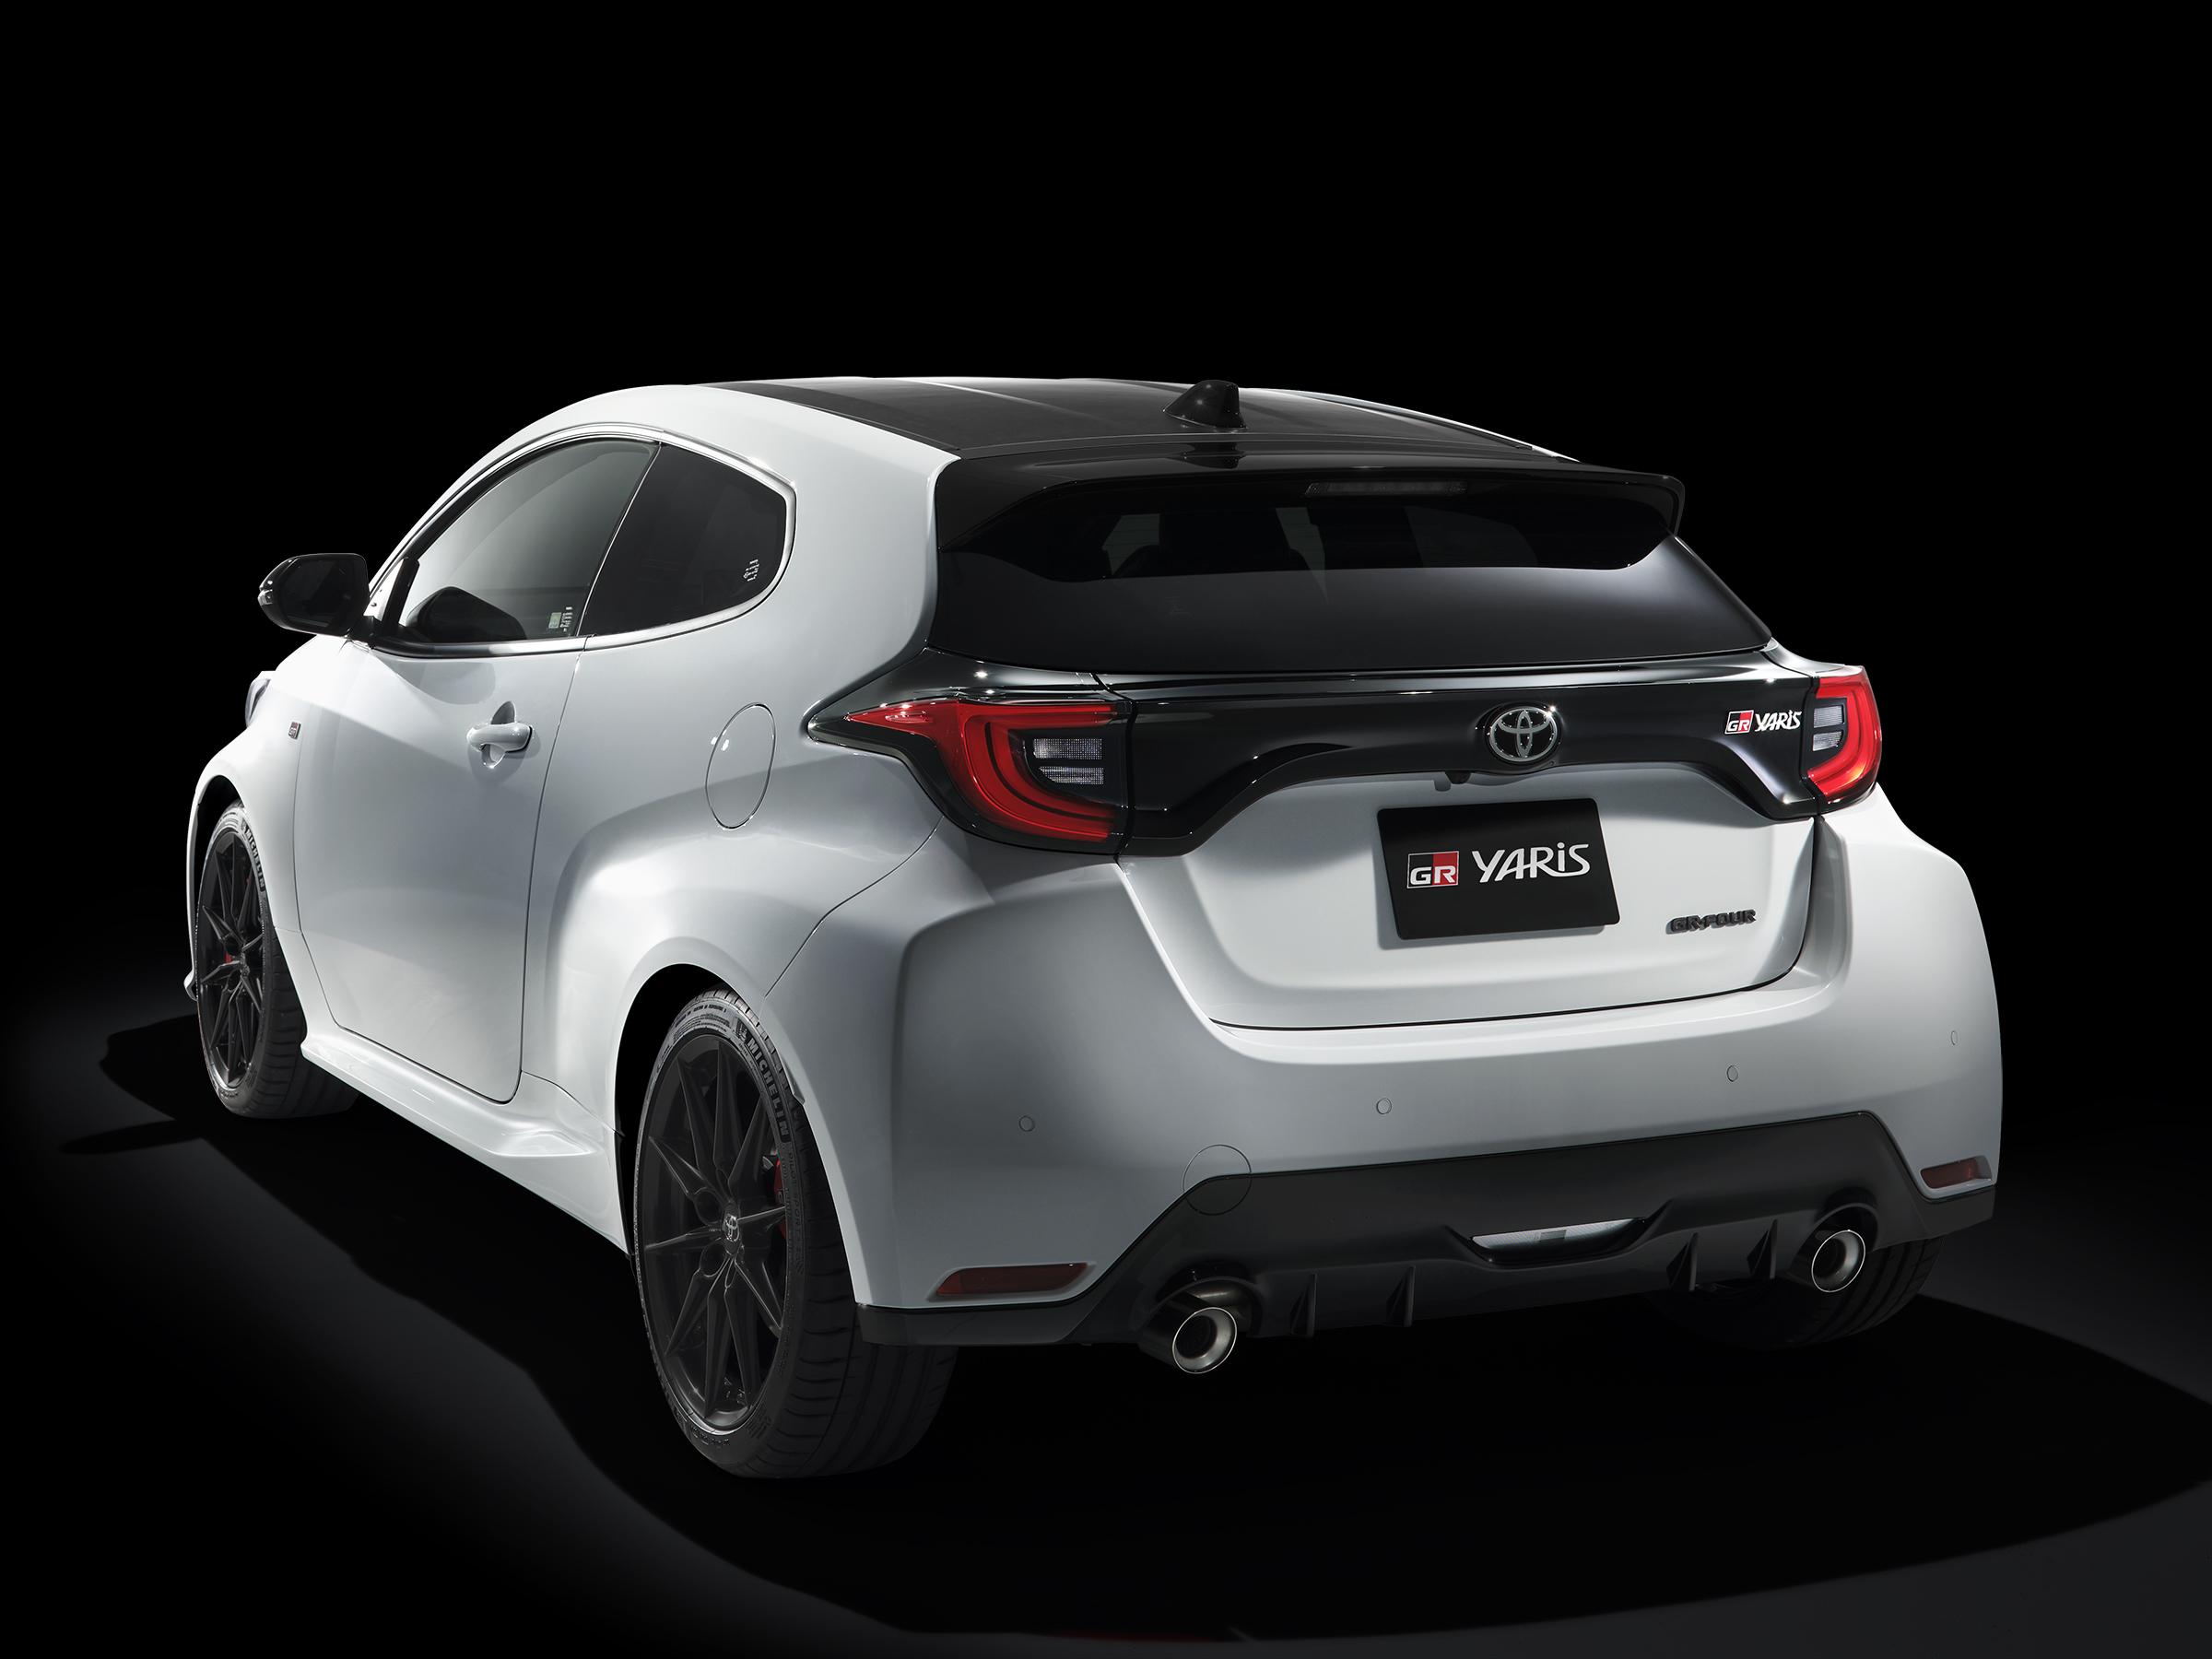 2020 Toyota GR Yaris: 7 highlights on Toyota's maddest hatch yet